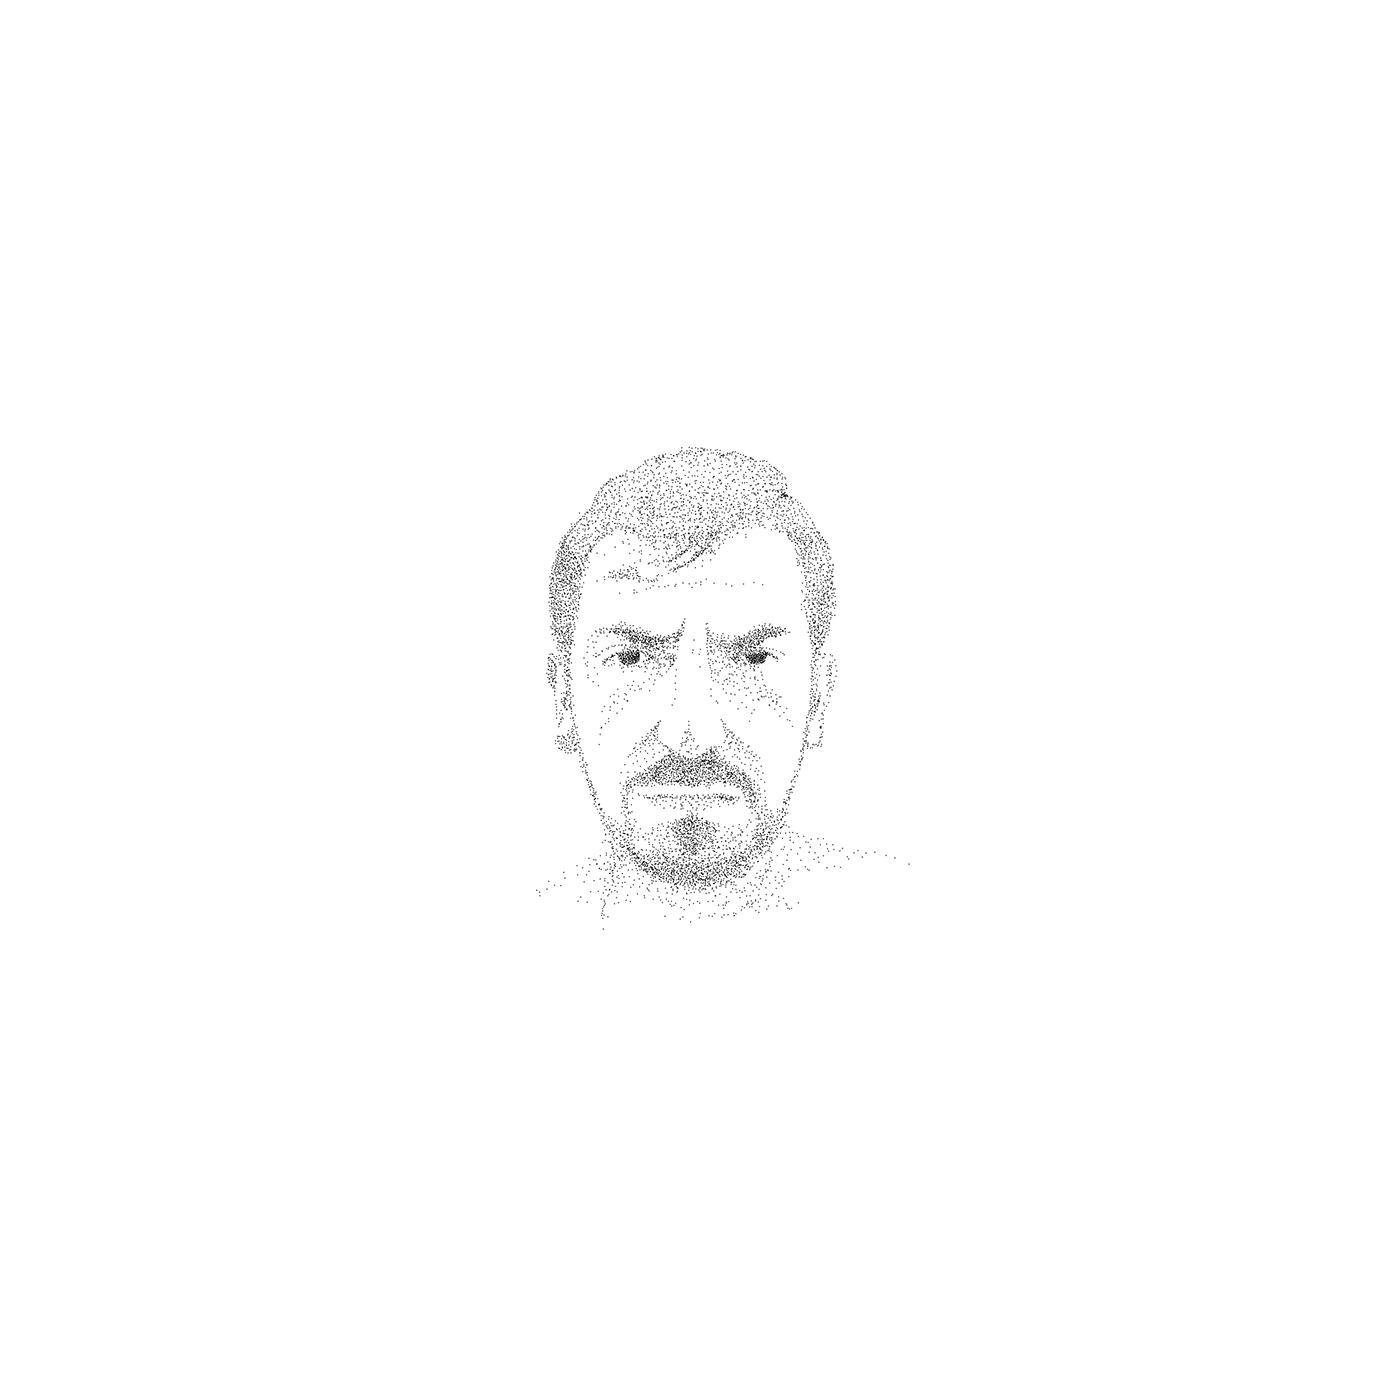 1400x1382 Self Portrait Adobe Draw Iphone Vector Art On Behance